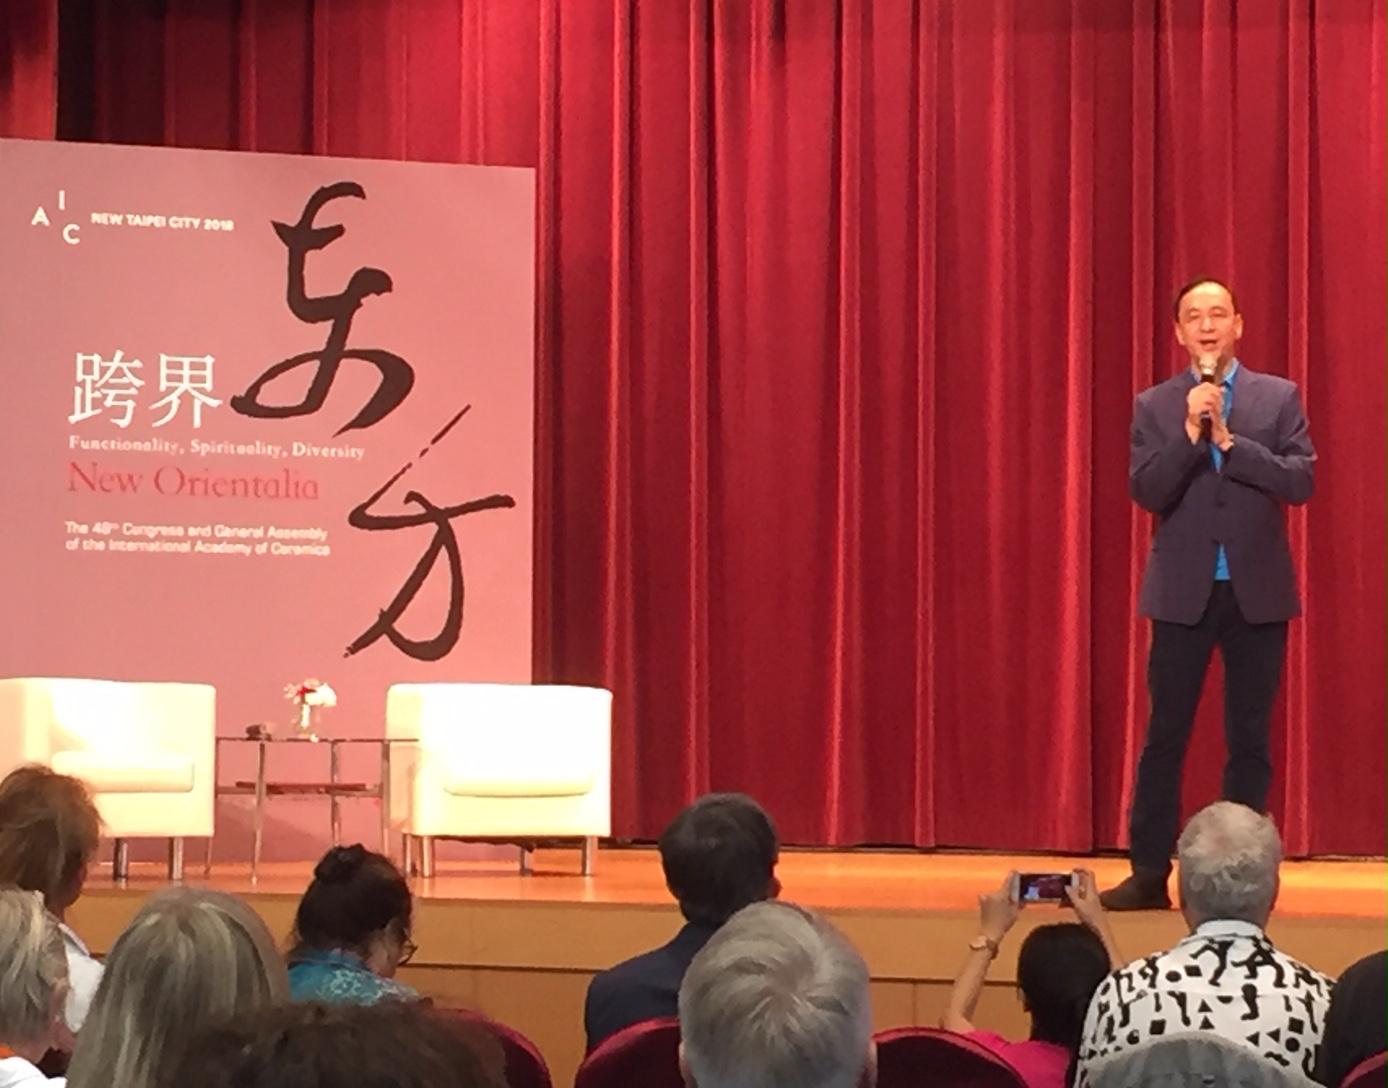 - Introduction by Mayor of Taipei City